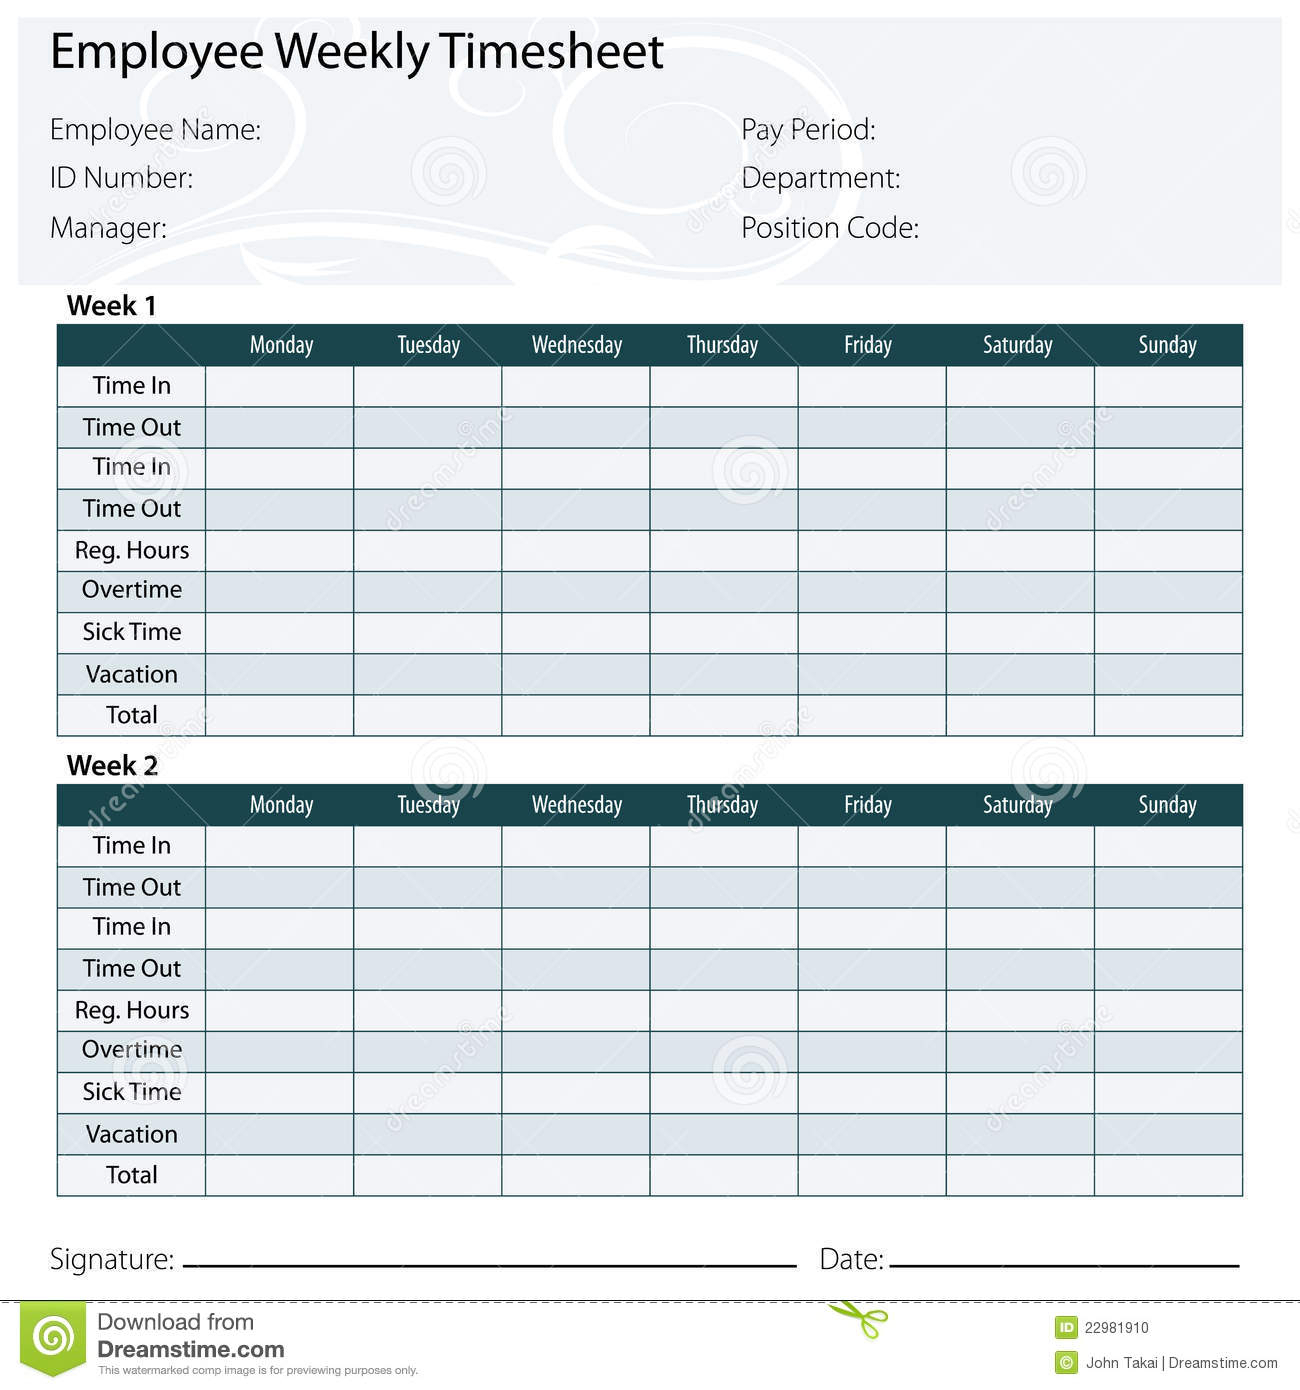 Employee Timesheet Template Stock Vector - Illustration Of Template Intended For Employee Timesheet Template